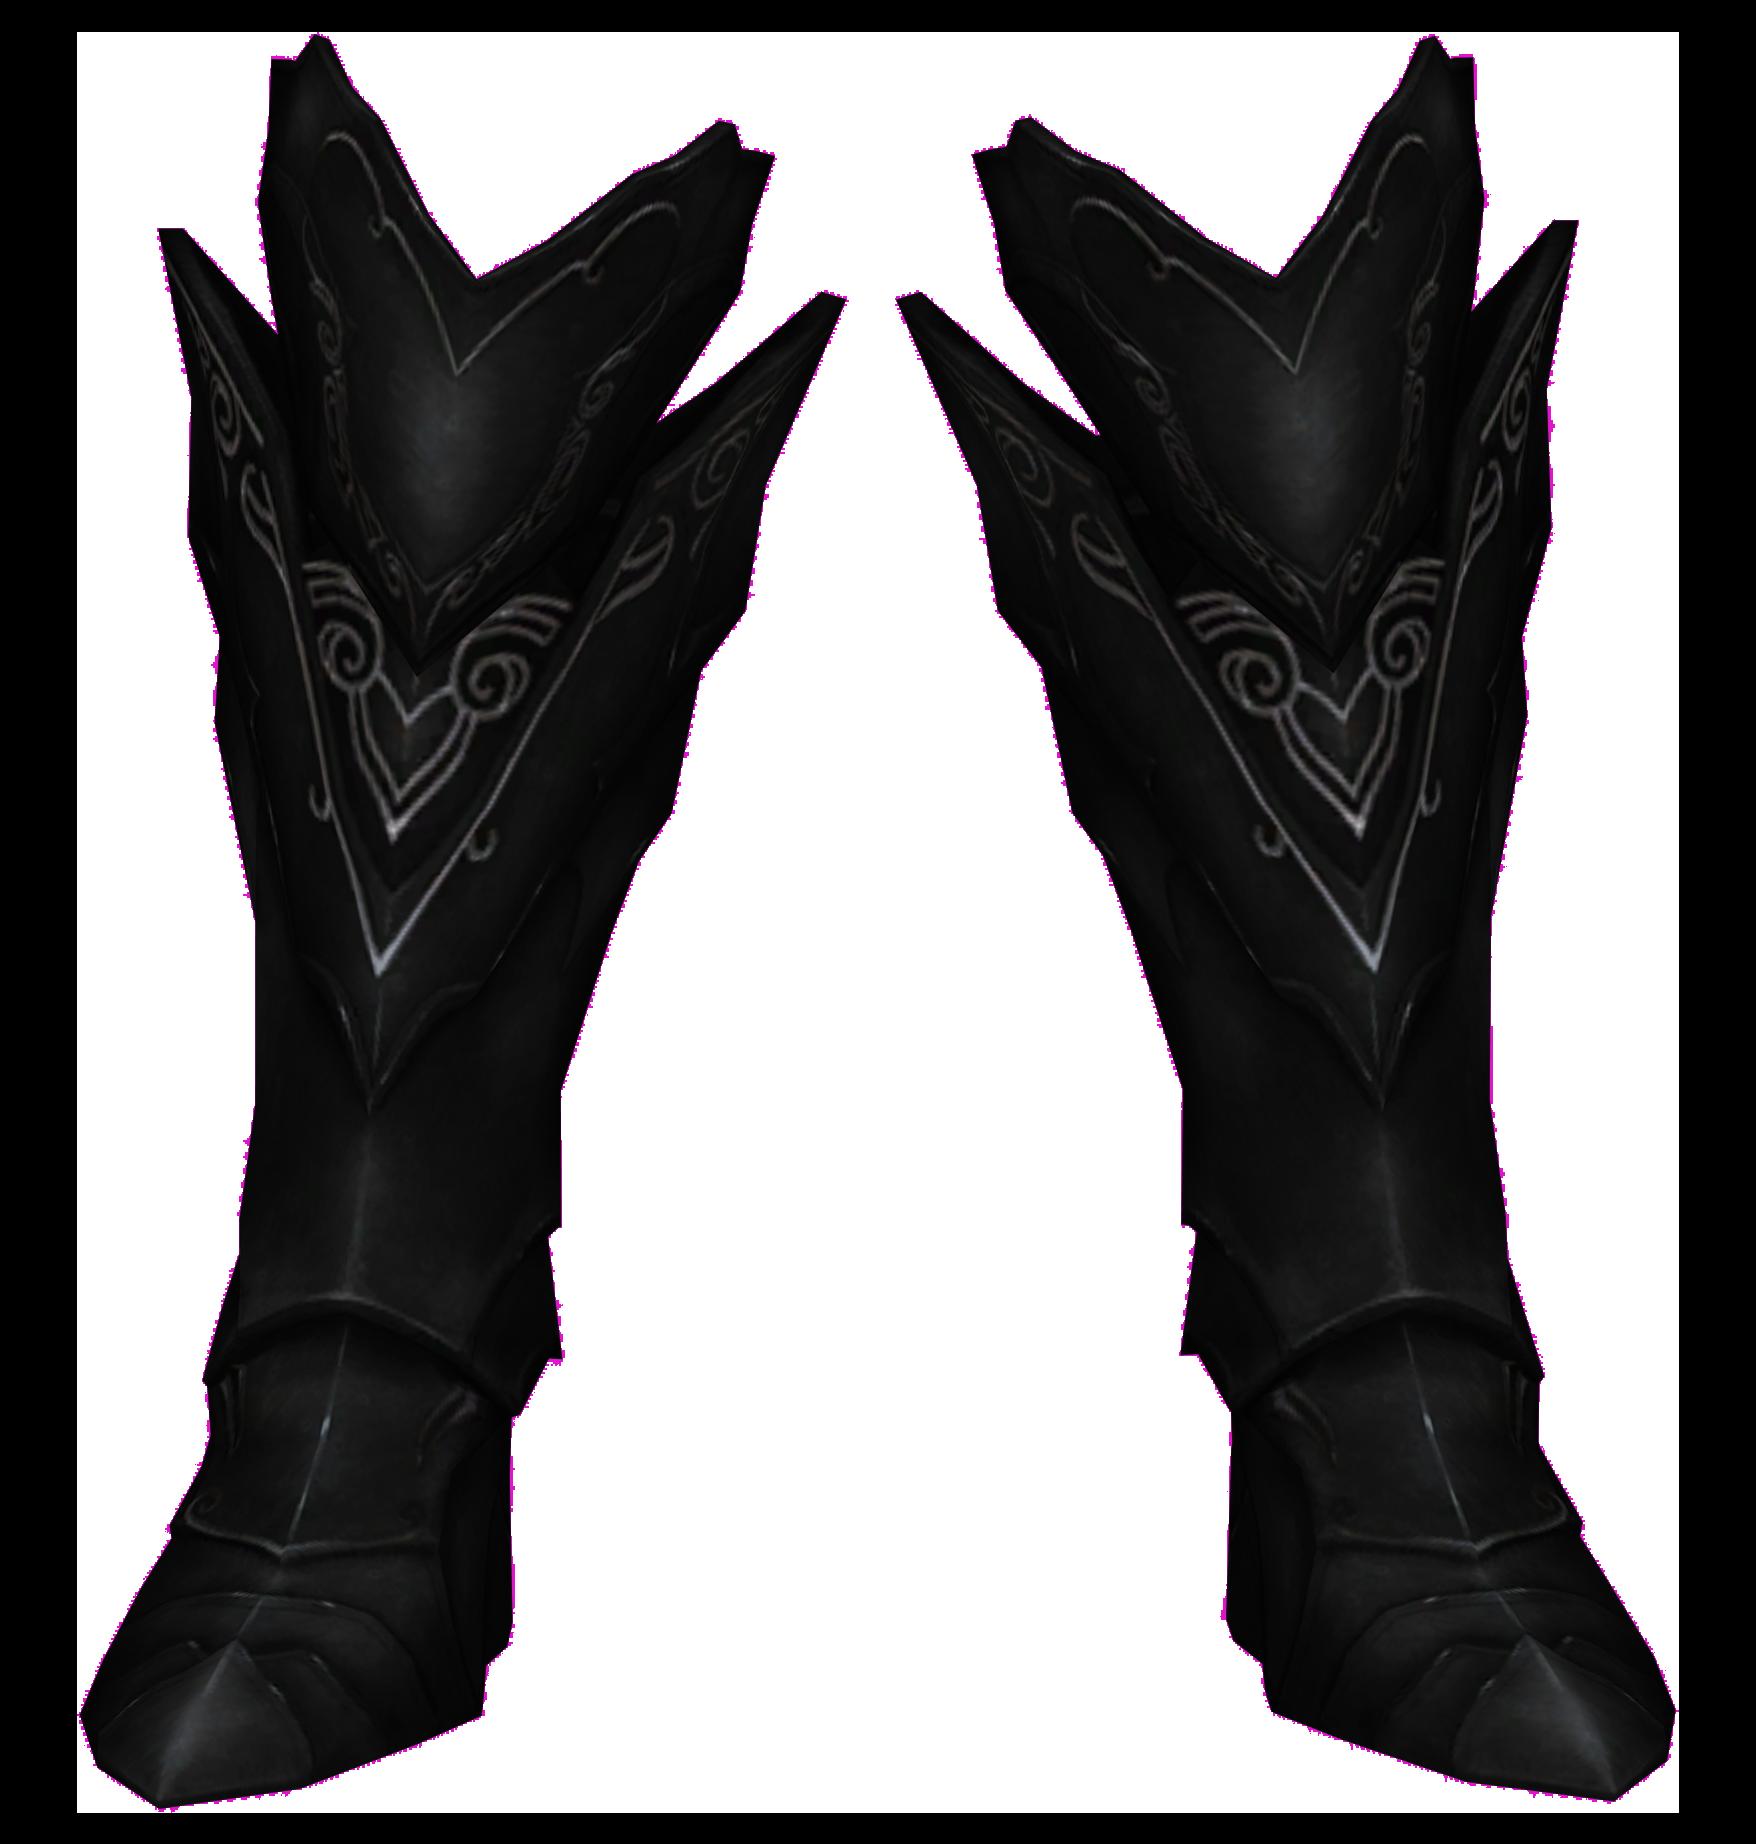 Ebony Boots (Skyrim)